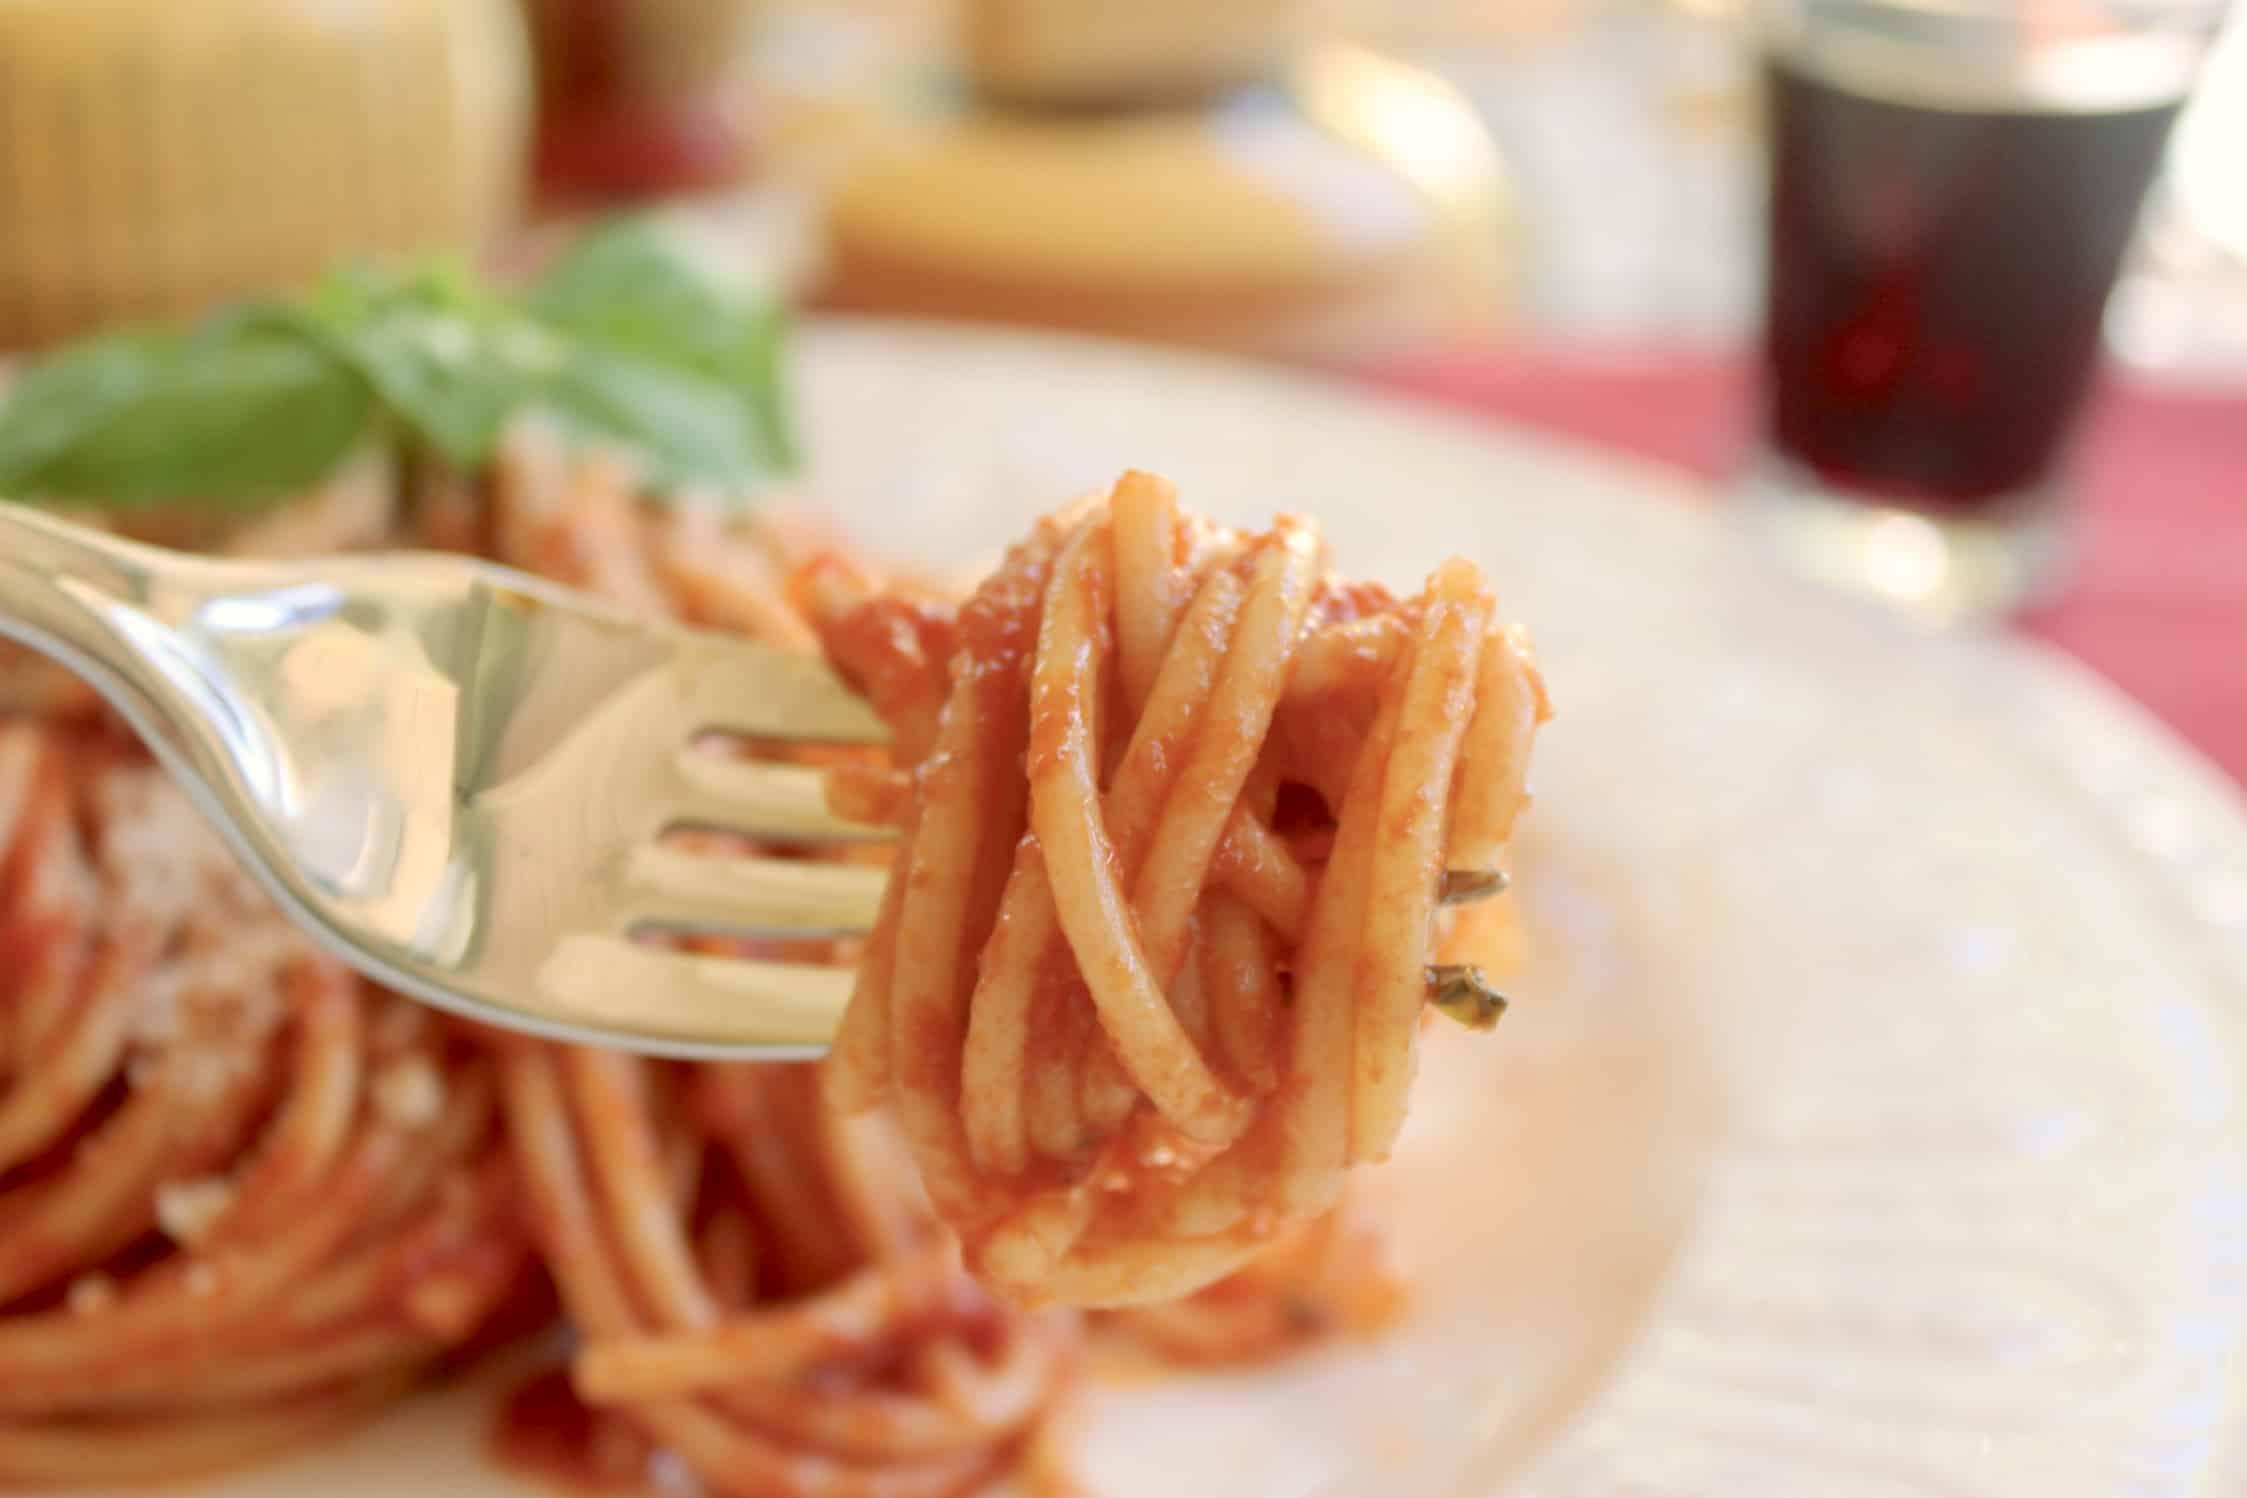 forkful of spaghetti